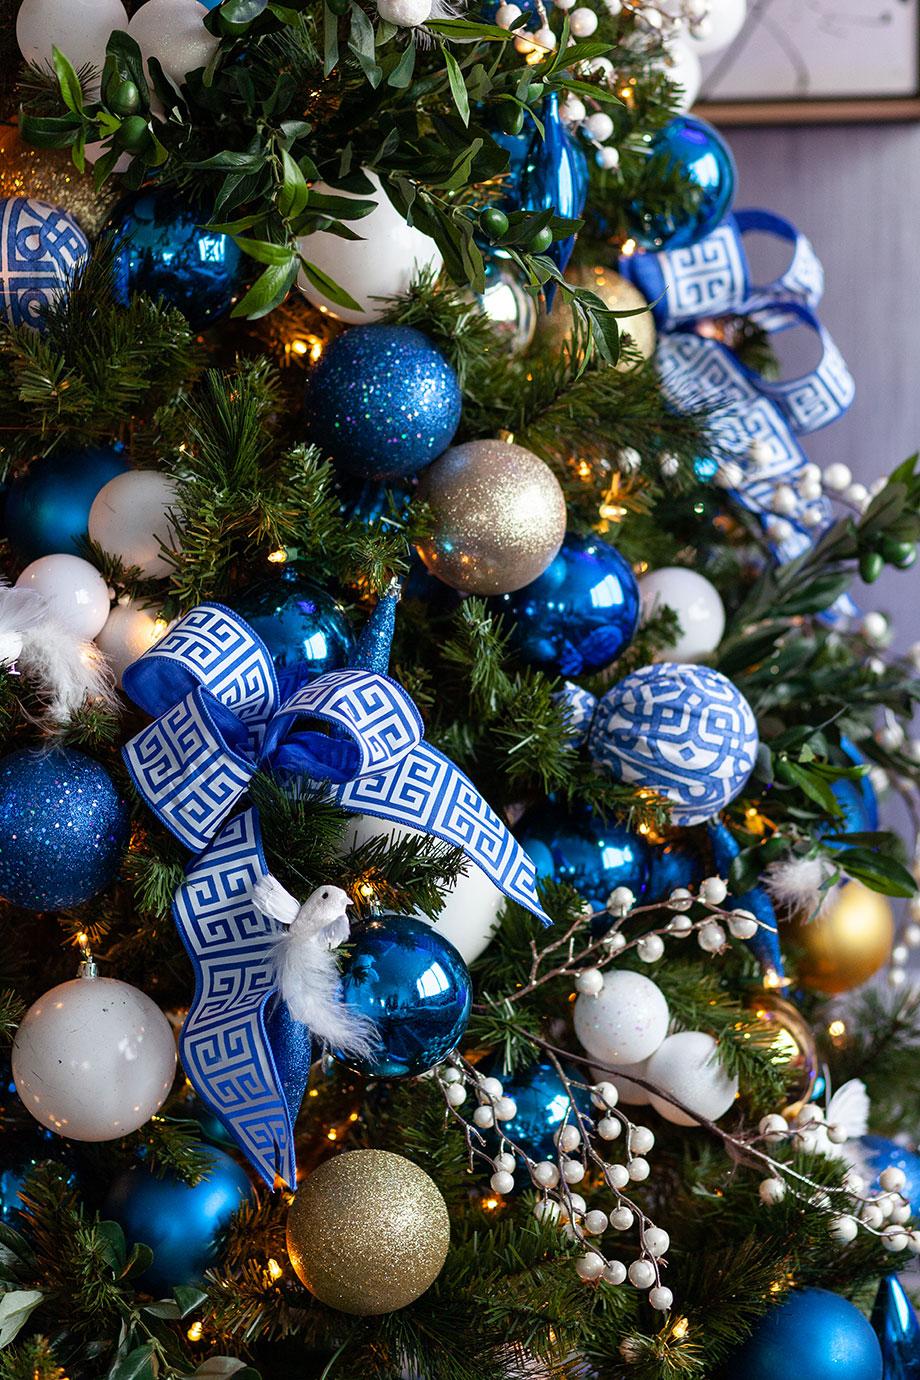 A Greek themed Christmas tree.